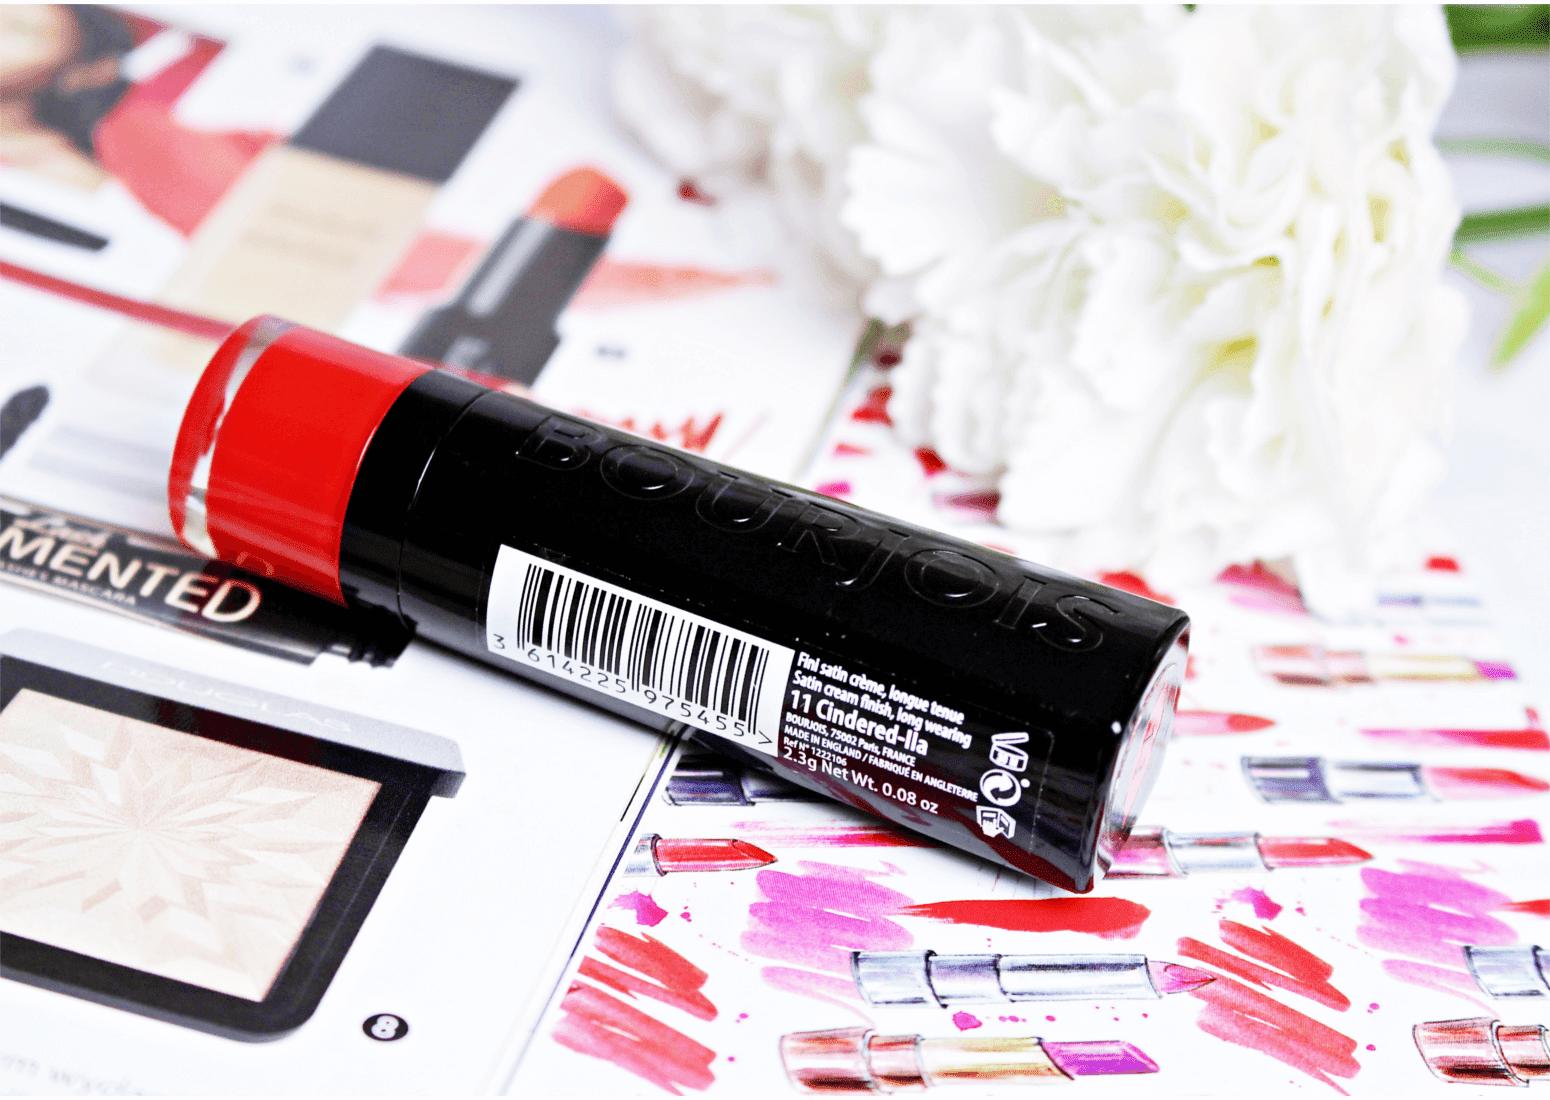 Pomadka Rouge Fabuleux Lipstick 11 Cindered-lla  Bourjois